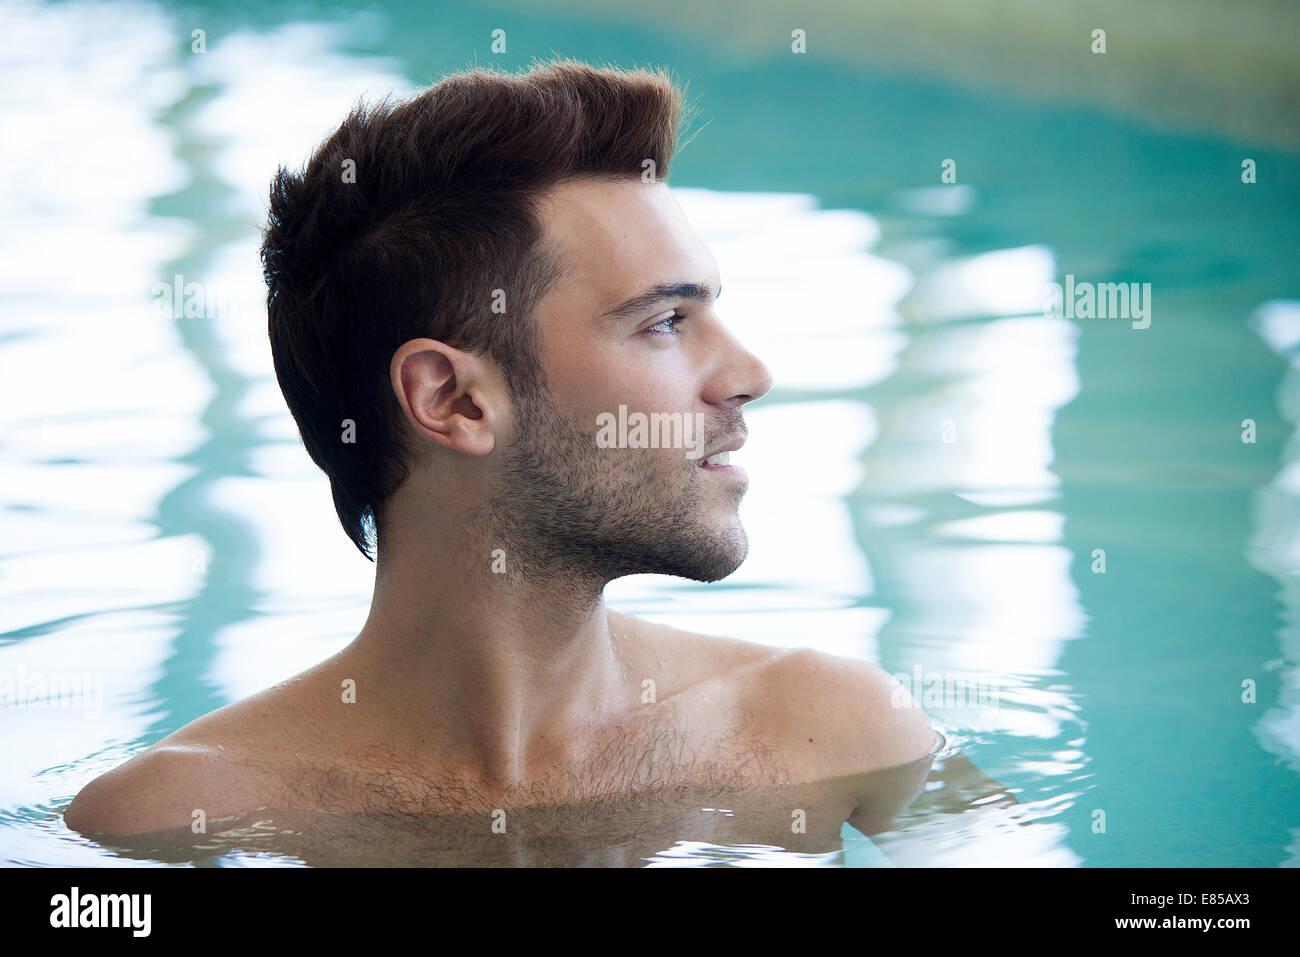 Joven relajándose en la piscina Imagen De Stock